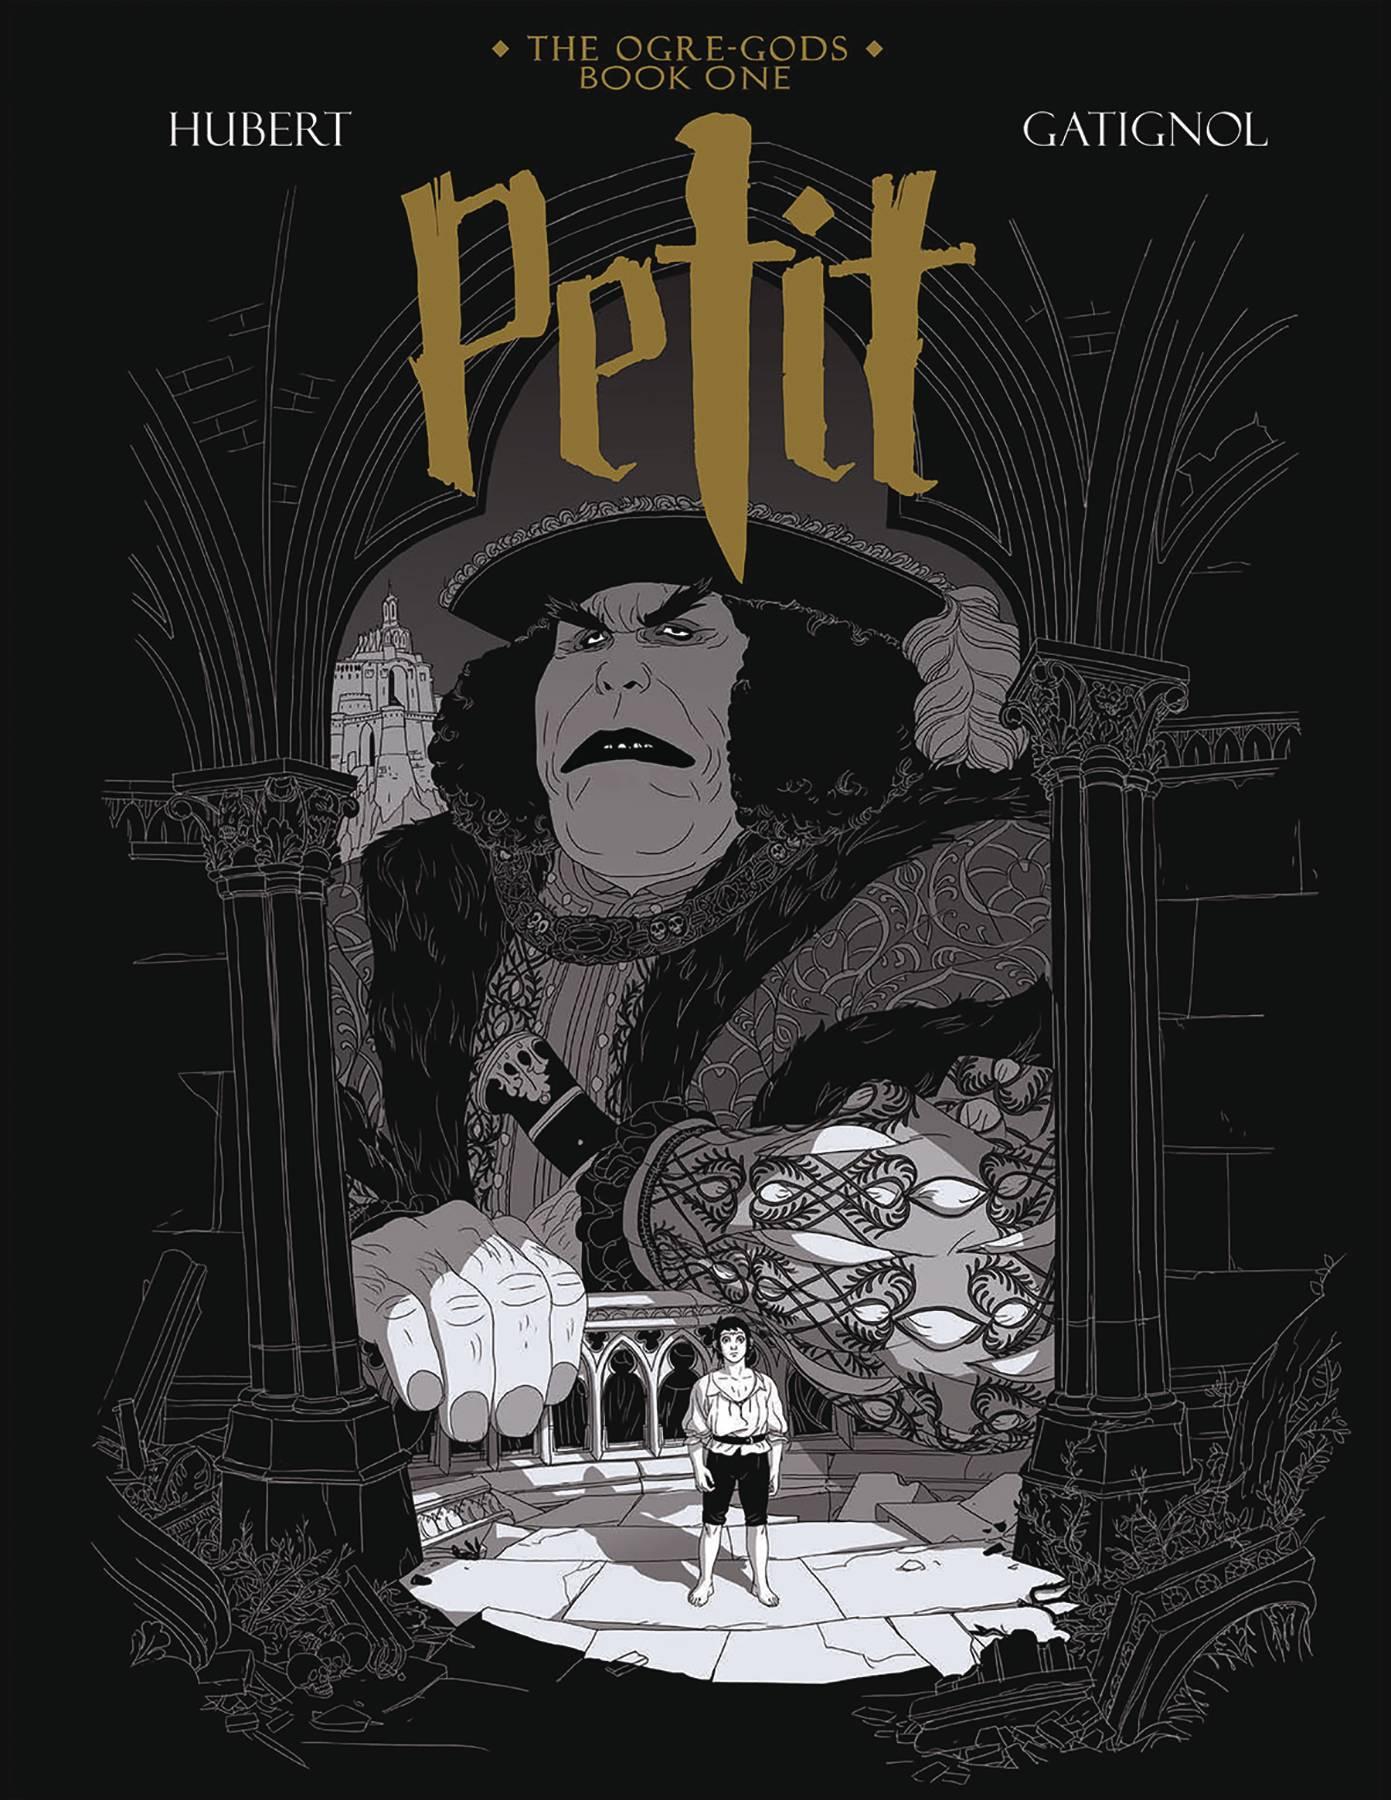 PETIT HC BOOK 01 OGRE GODS